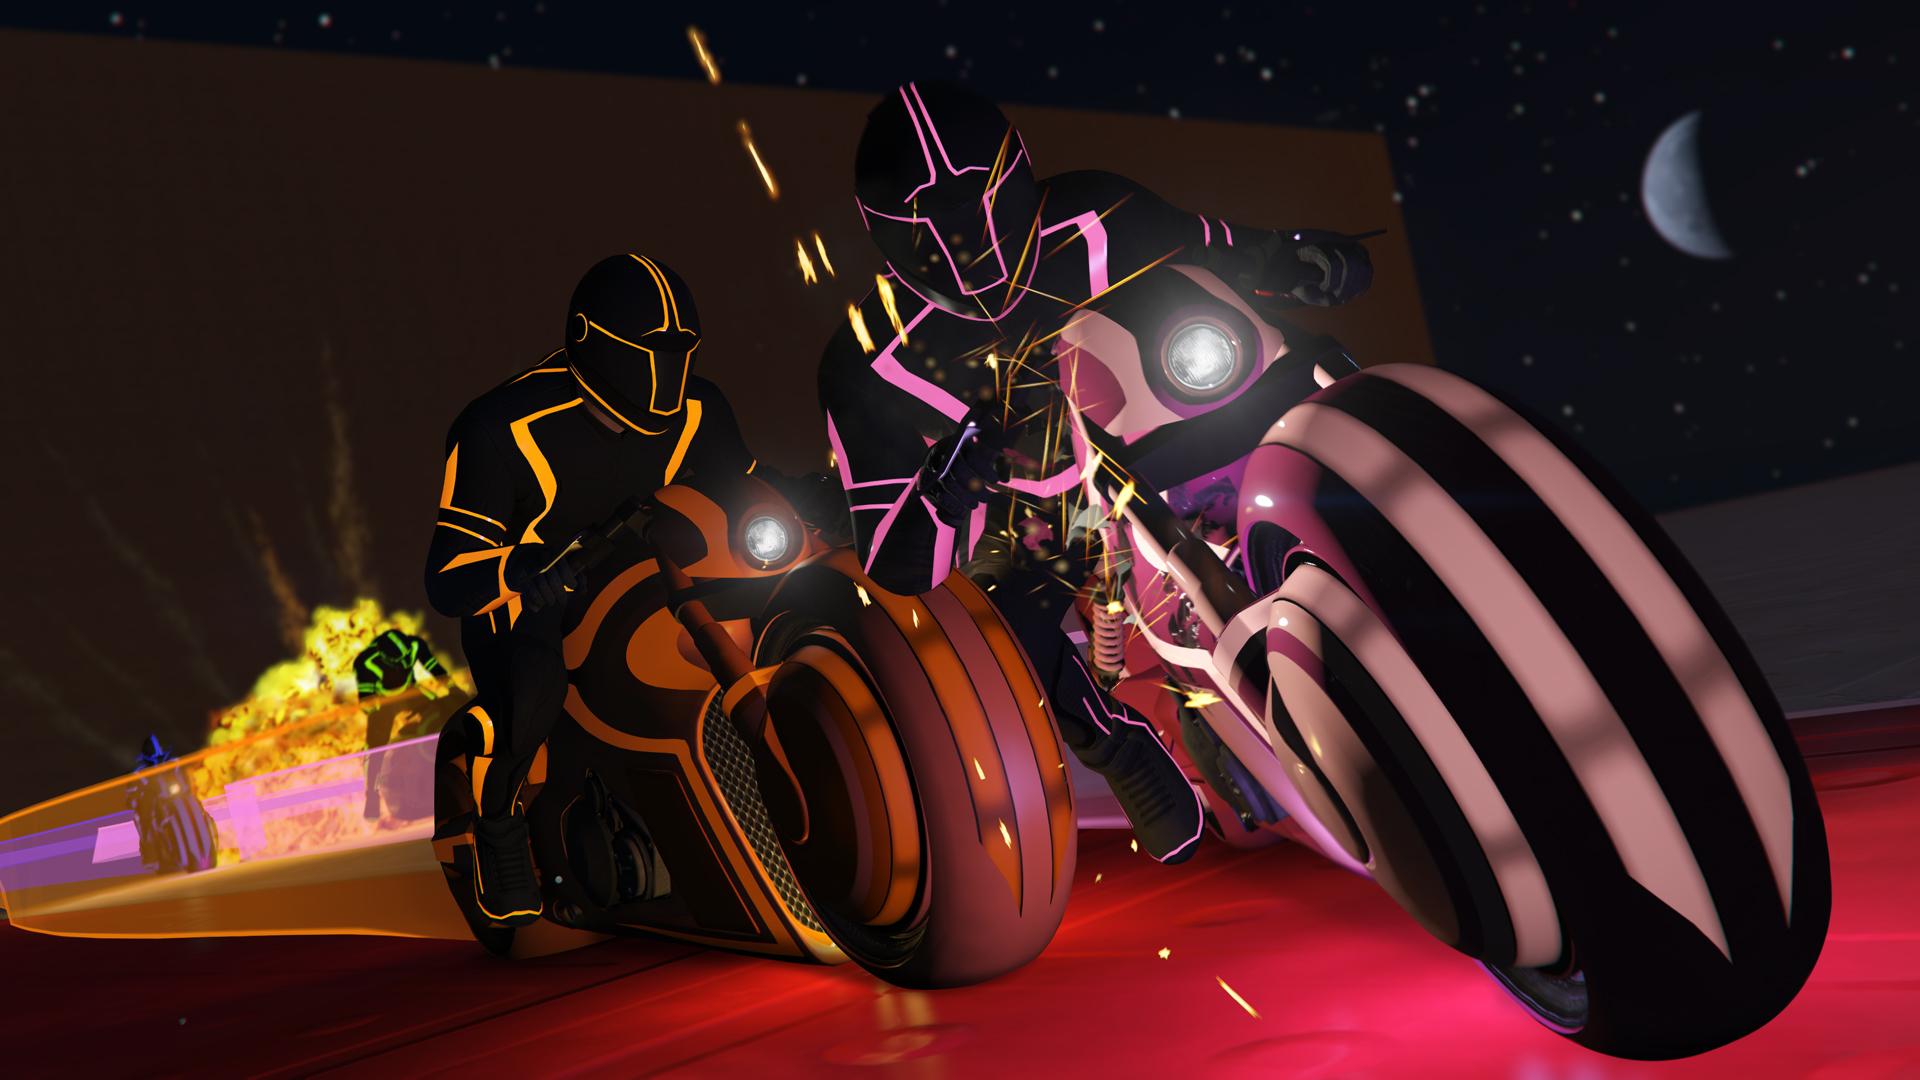 GTA V Update New DEADLINE Mode And Shotaro Bike And More